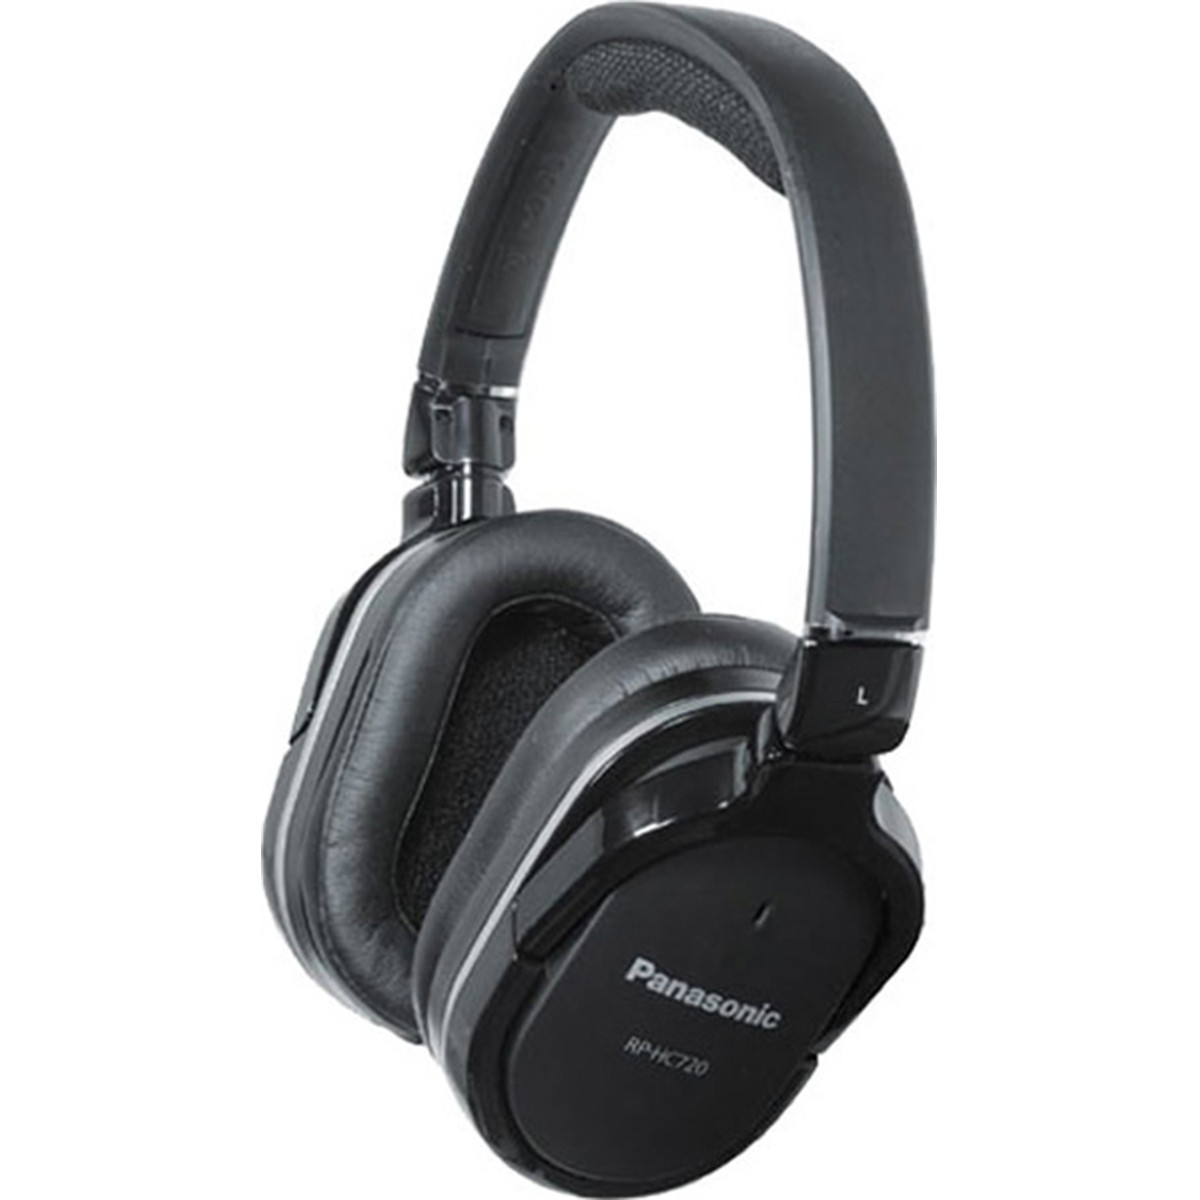 Panasonic RP-HC720 Fone de Ouvido, Cancela Ruídos